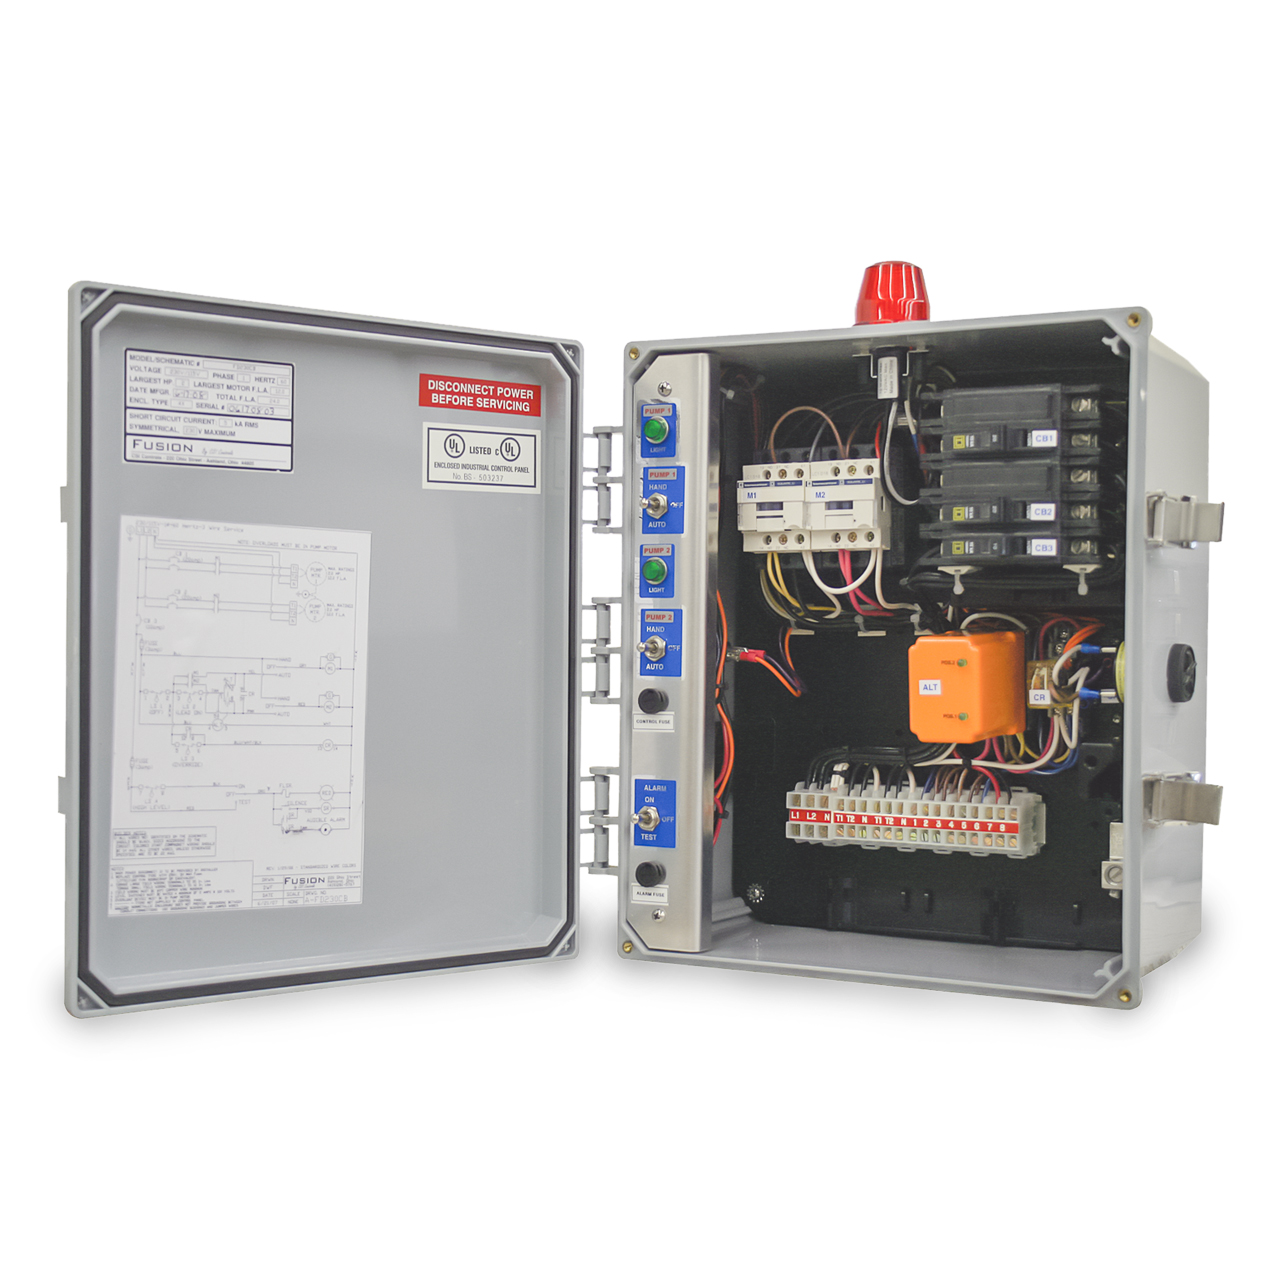 Float Switch Wiring Diagram Csi Controls Csi Controls Fd230cb Fc20 X Fusion Duplex